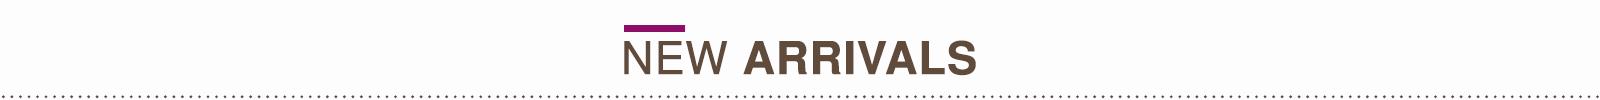 yves-rocher-flagship-new-arrivals-banner